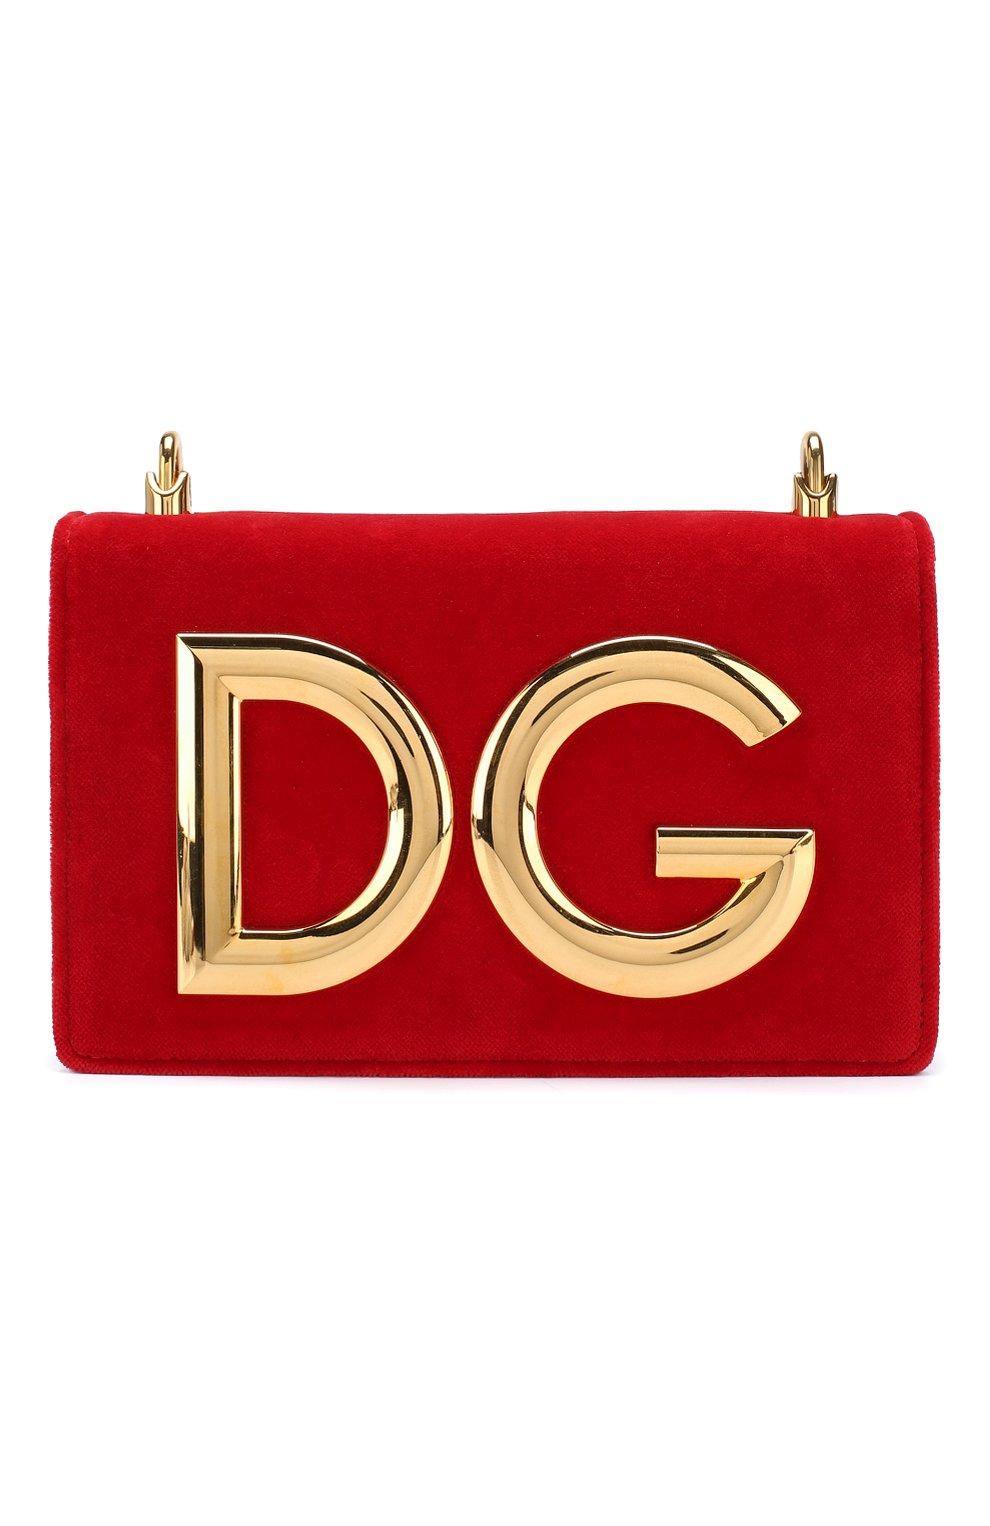 Сумка DG Girls из бархата Dolce & Gabbana красная цвета | Фото №1